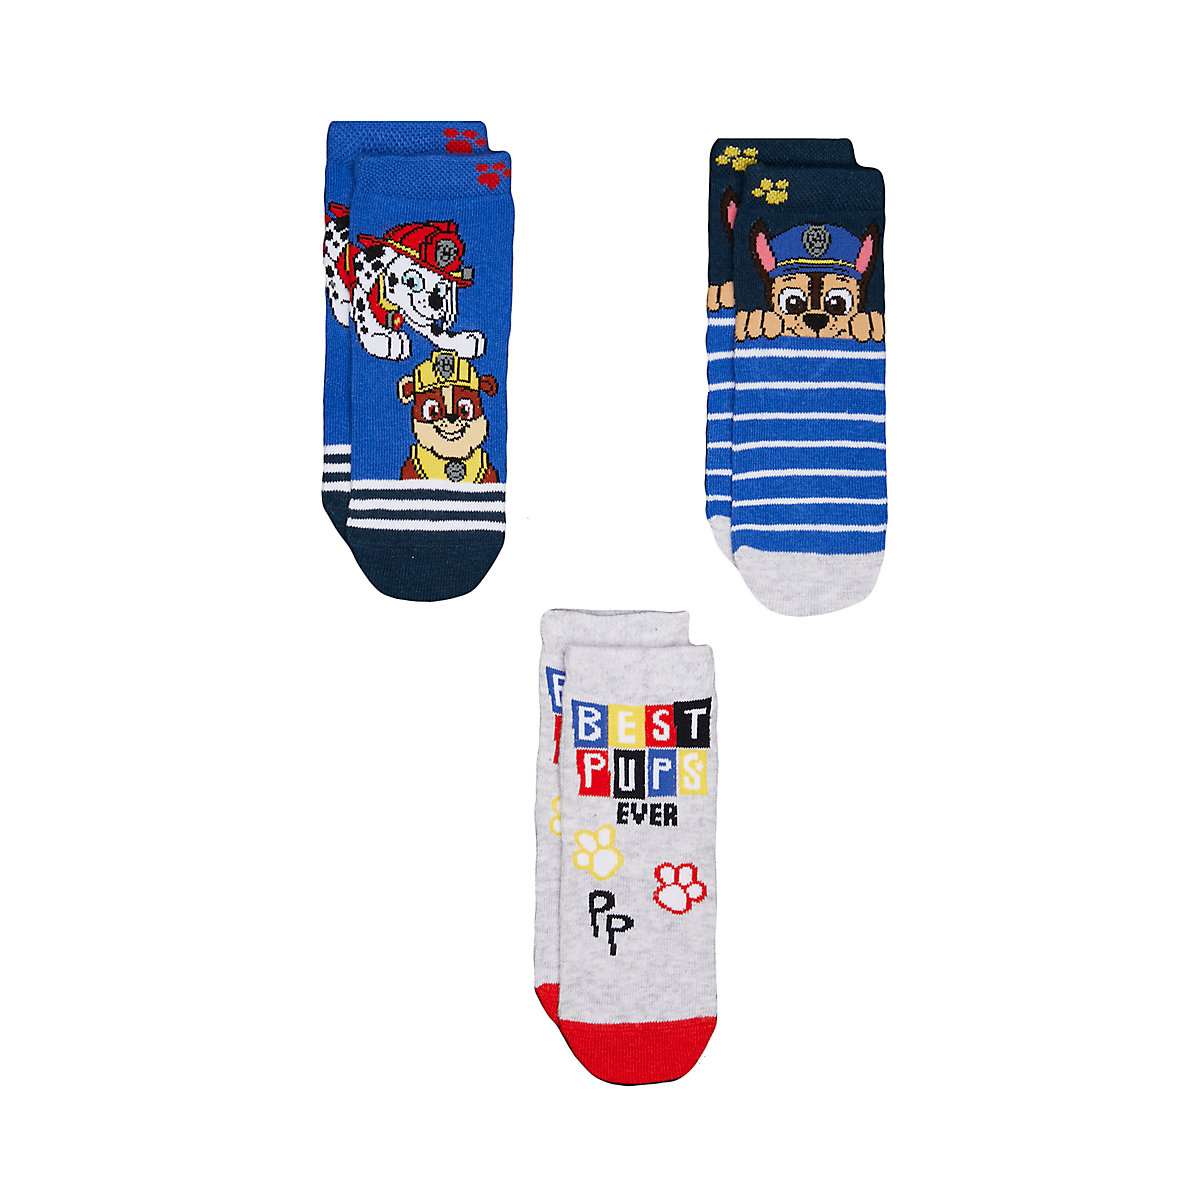 PAW Patrol Socks   3 Pack